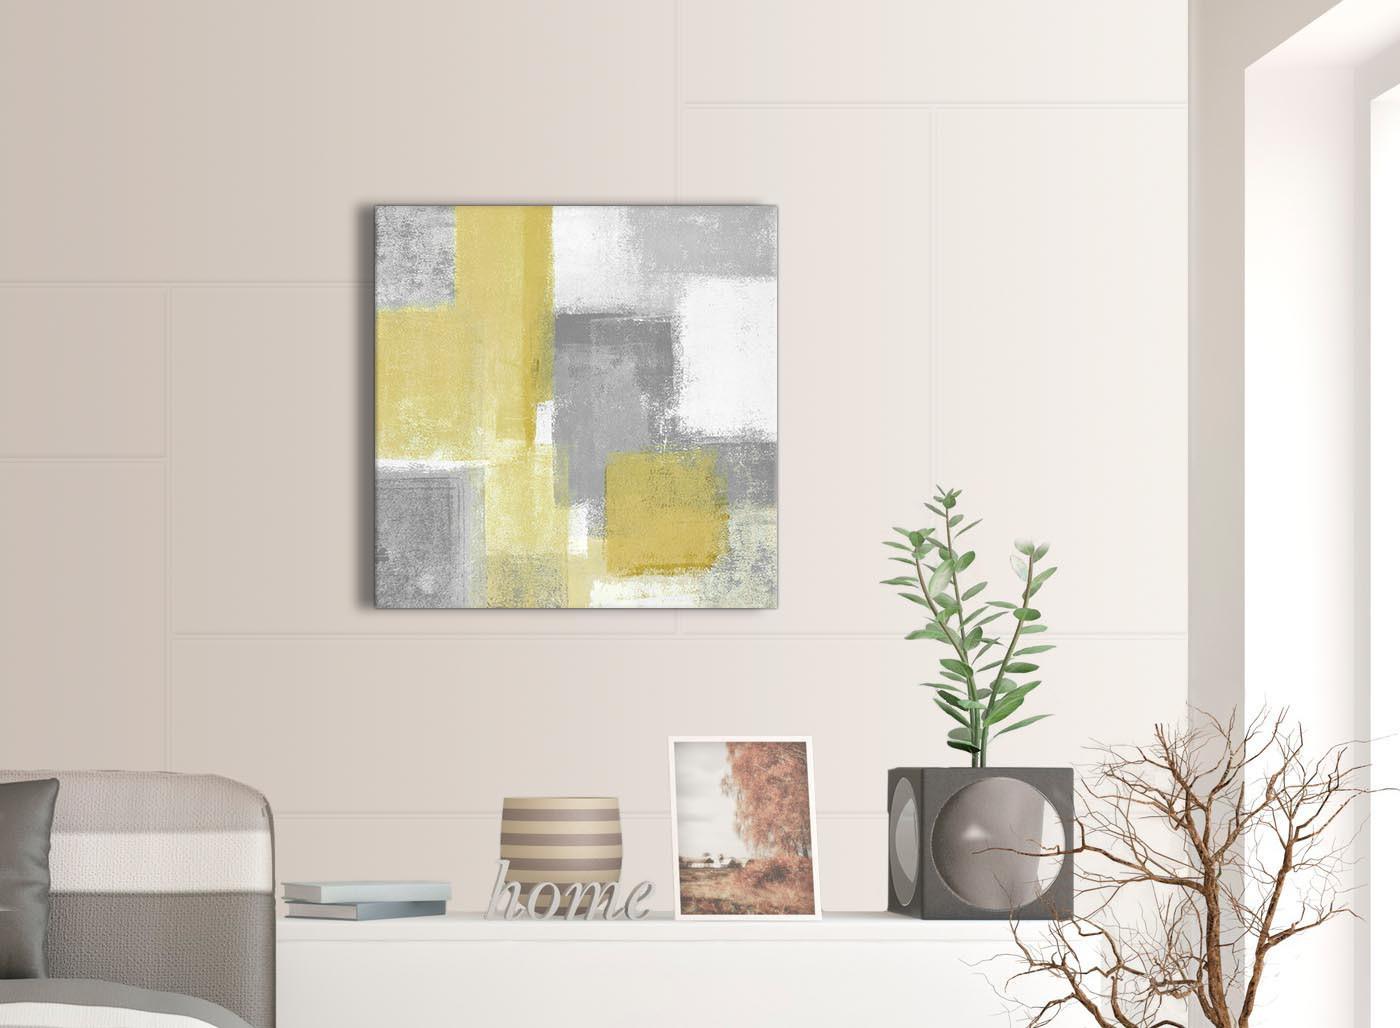 Mustard yellow grey kitchen canvas wall art decorations for Mustard yellow decor